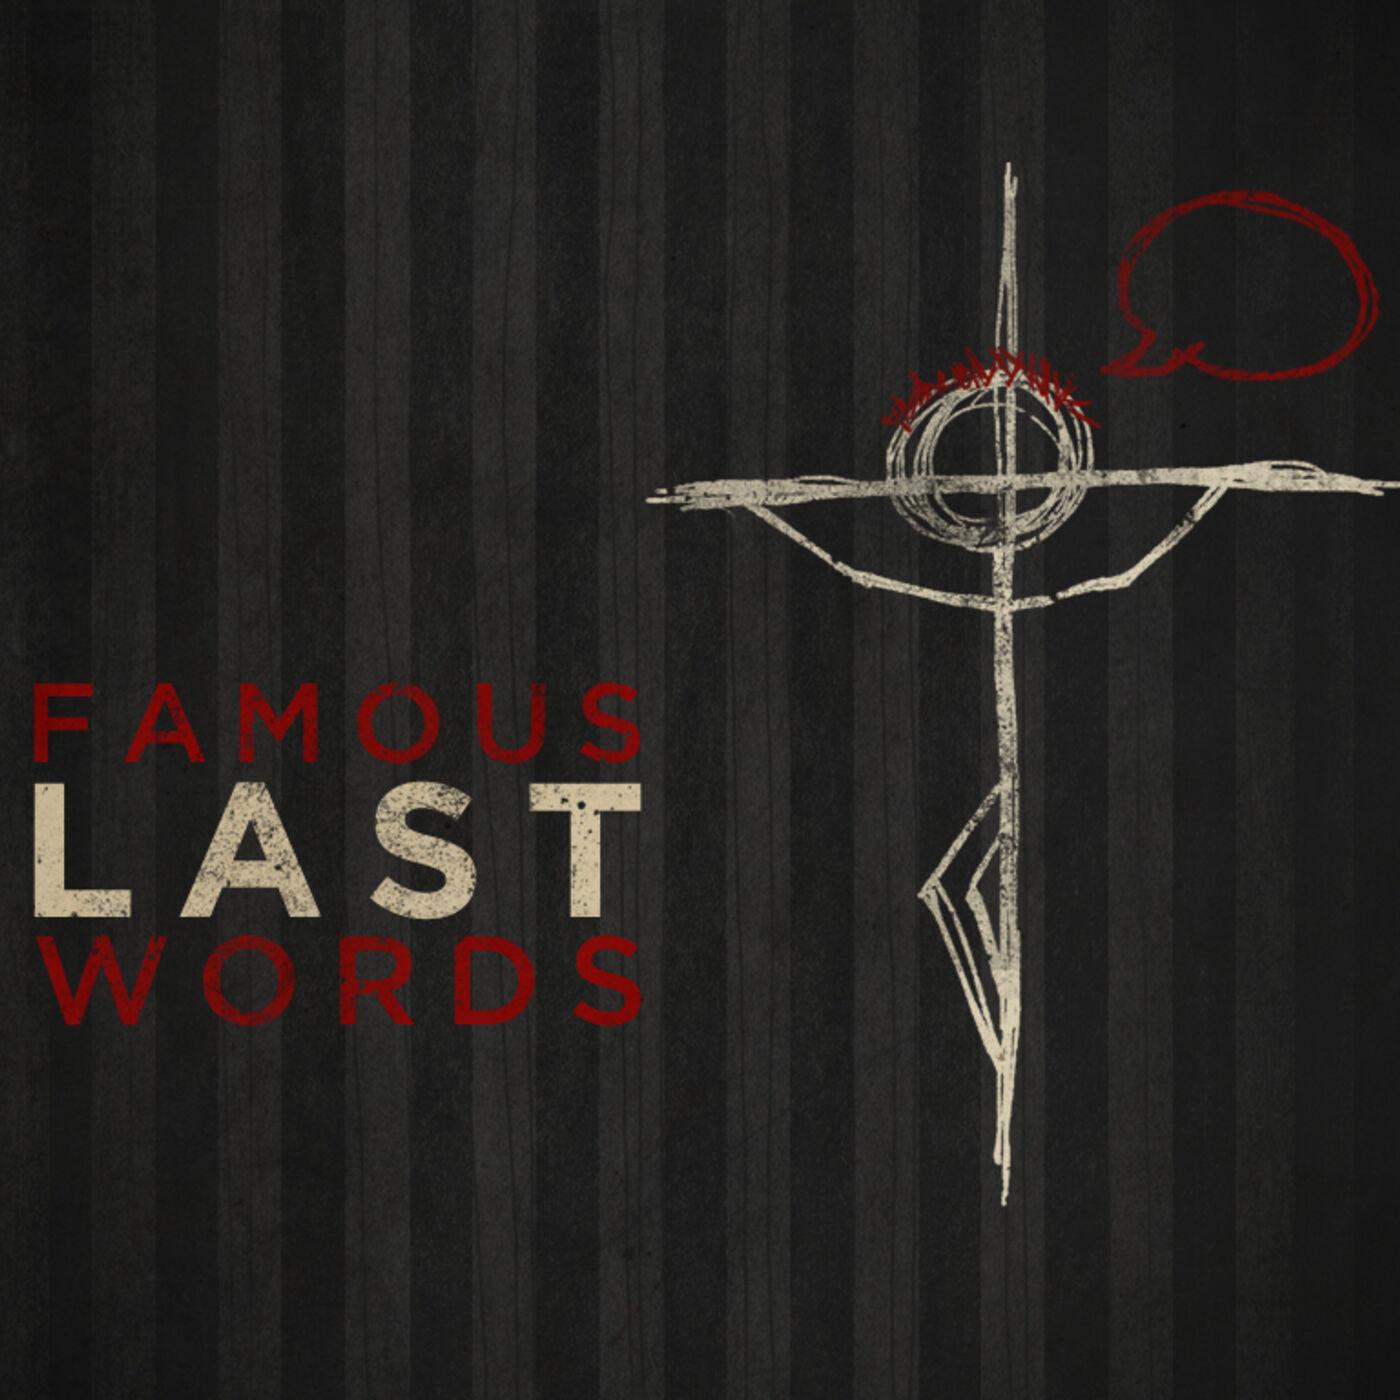 Famous Last Words - Week 6